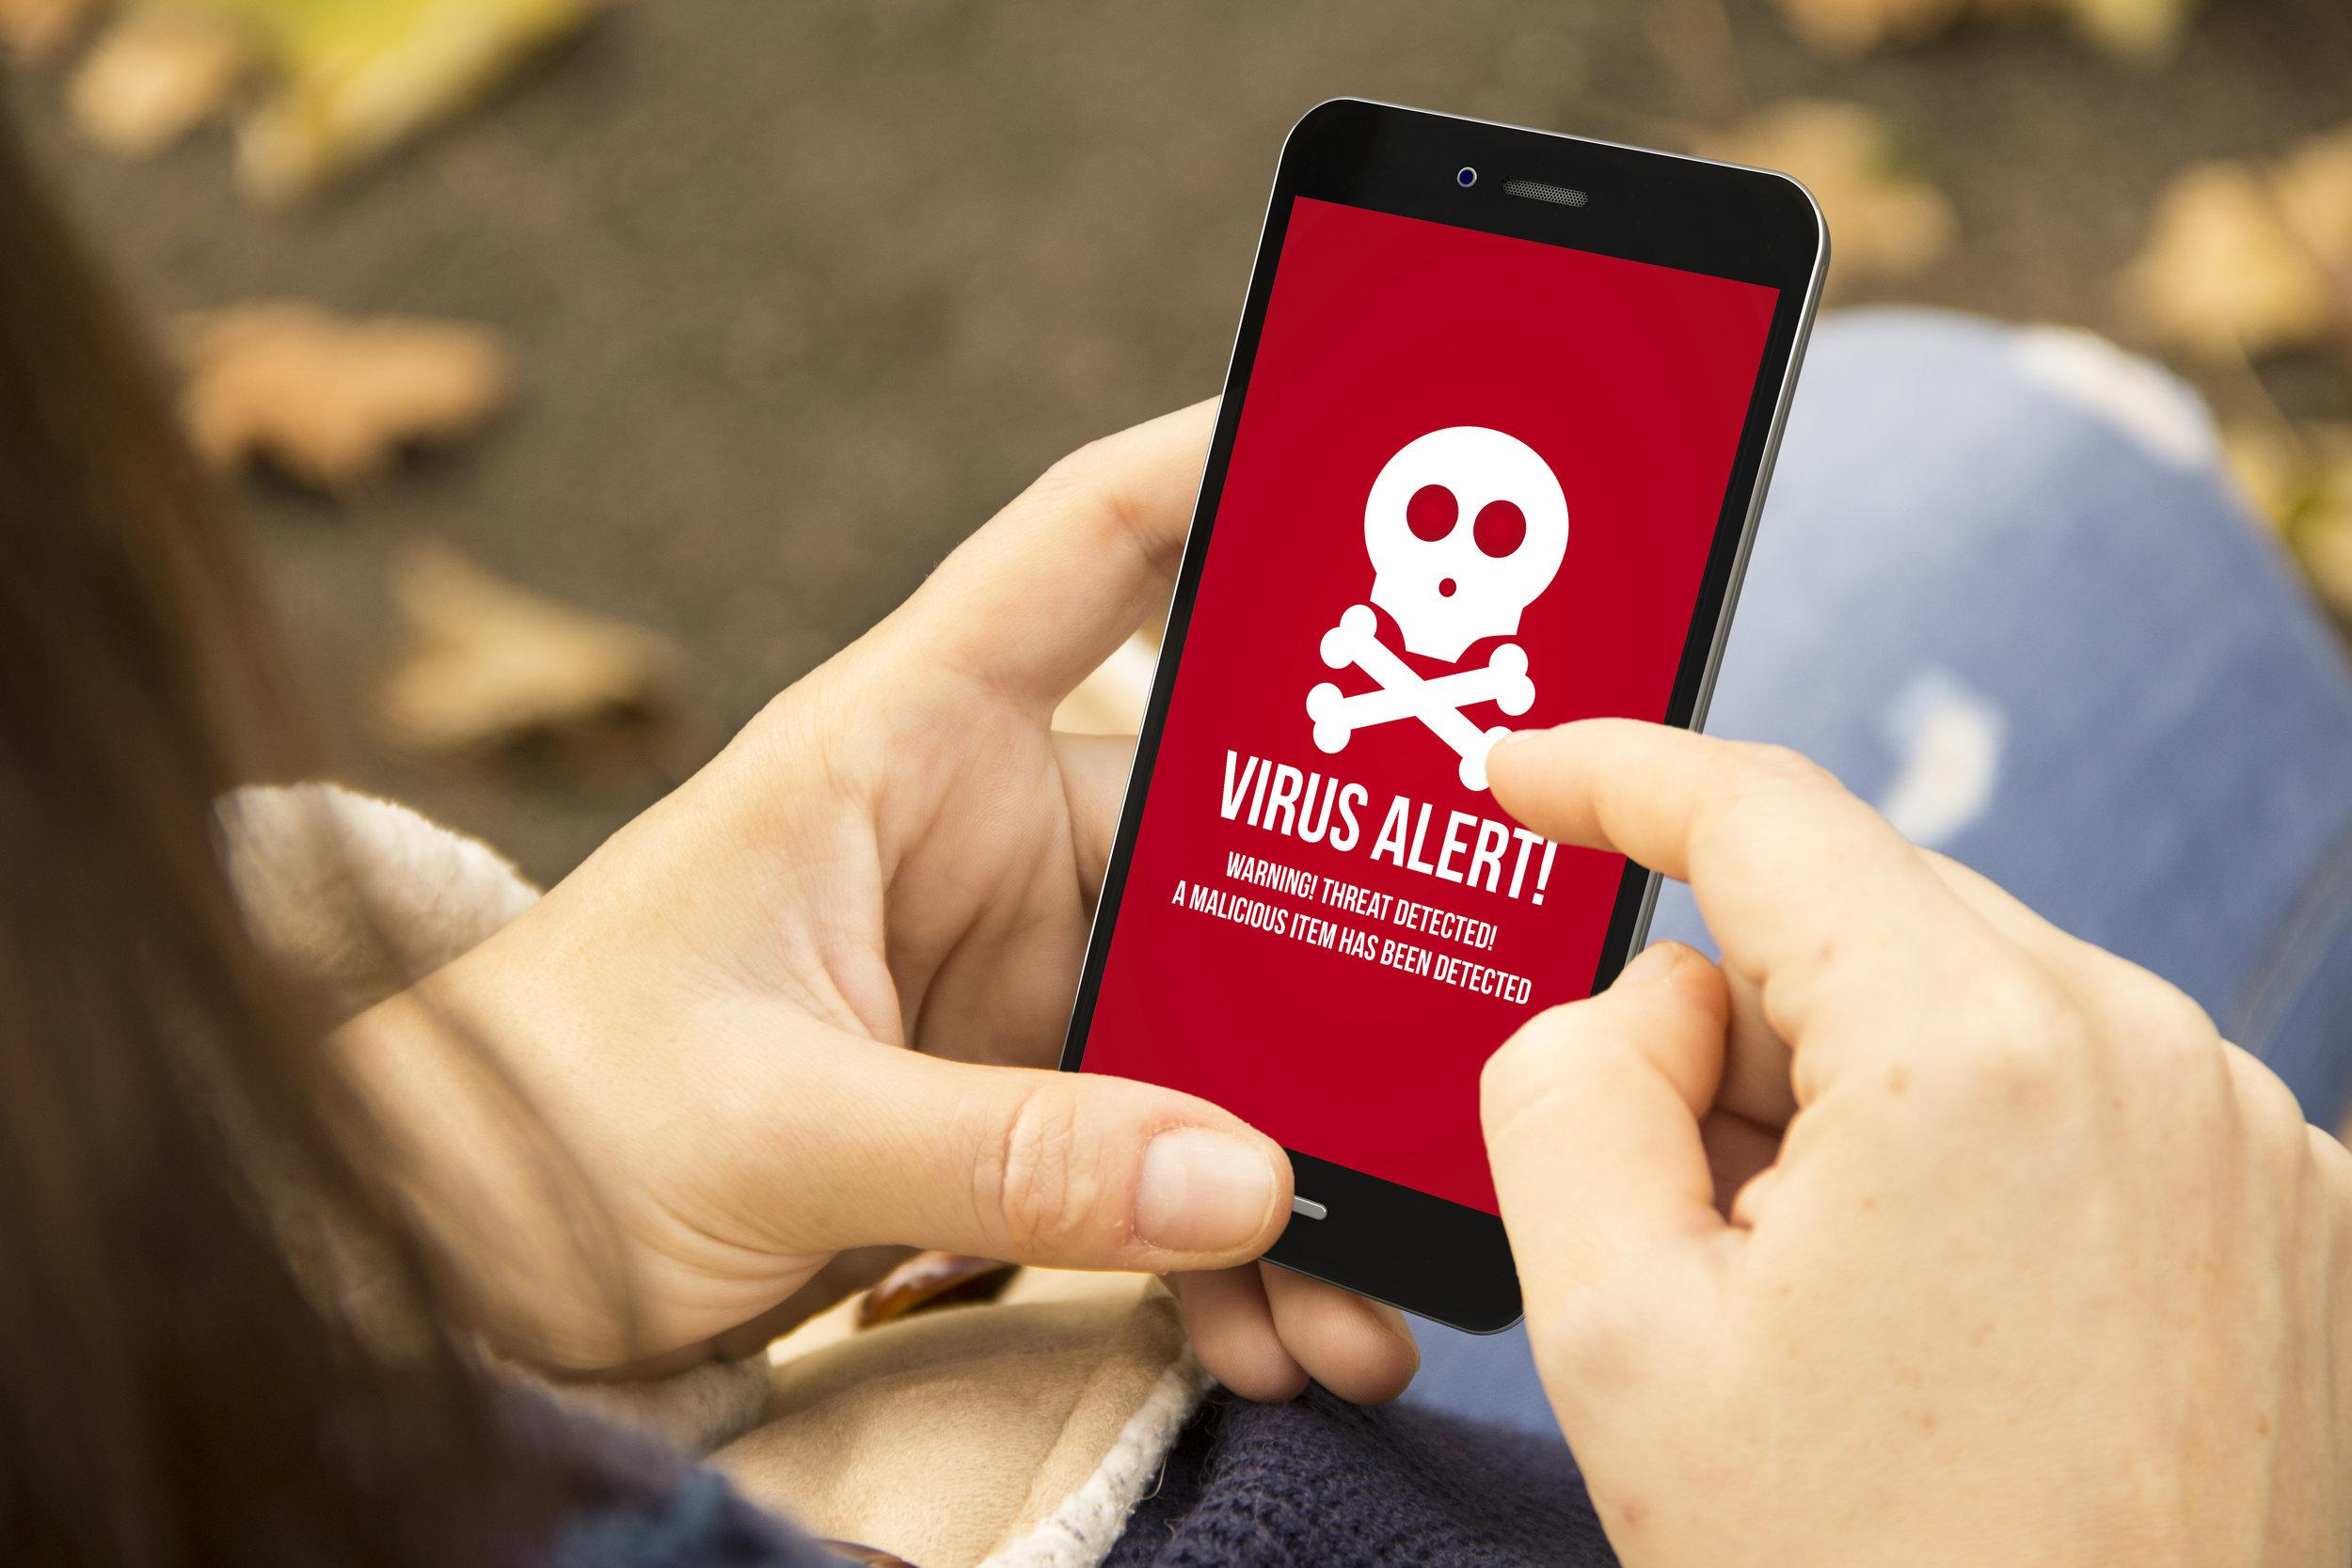 Malware on phone